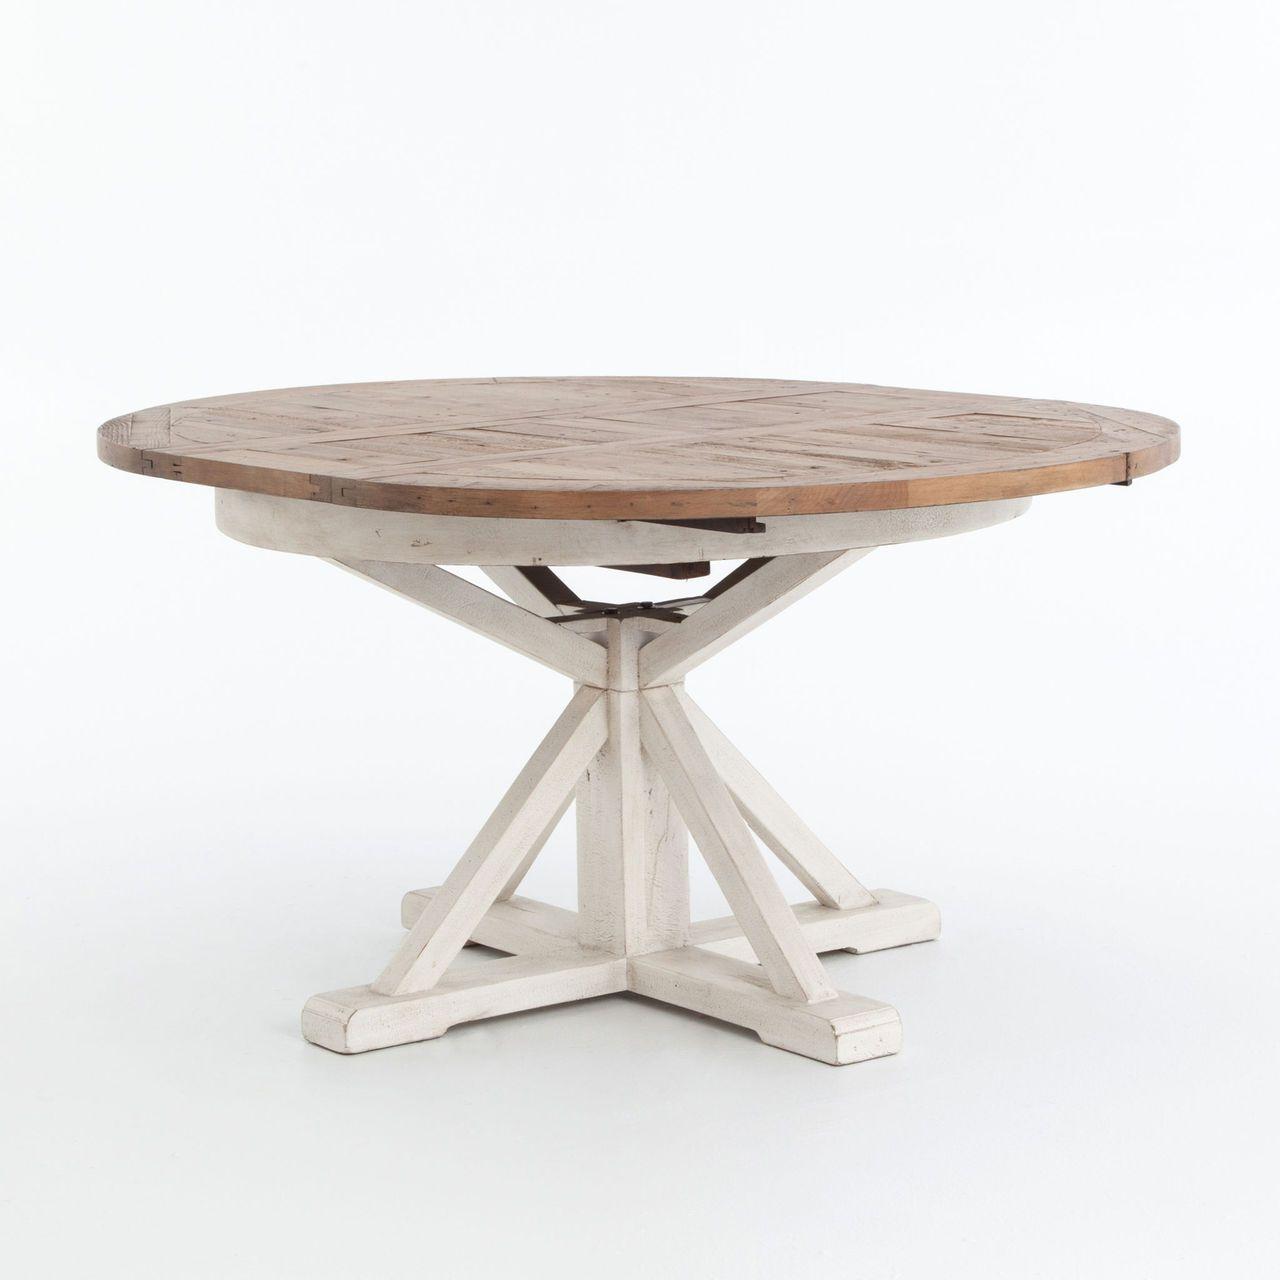 Round intended for Black Olive Hart Reclaimed Pedestal Extending Dining Tables